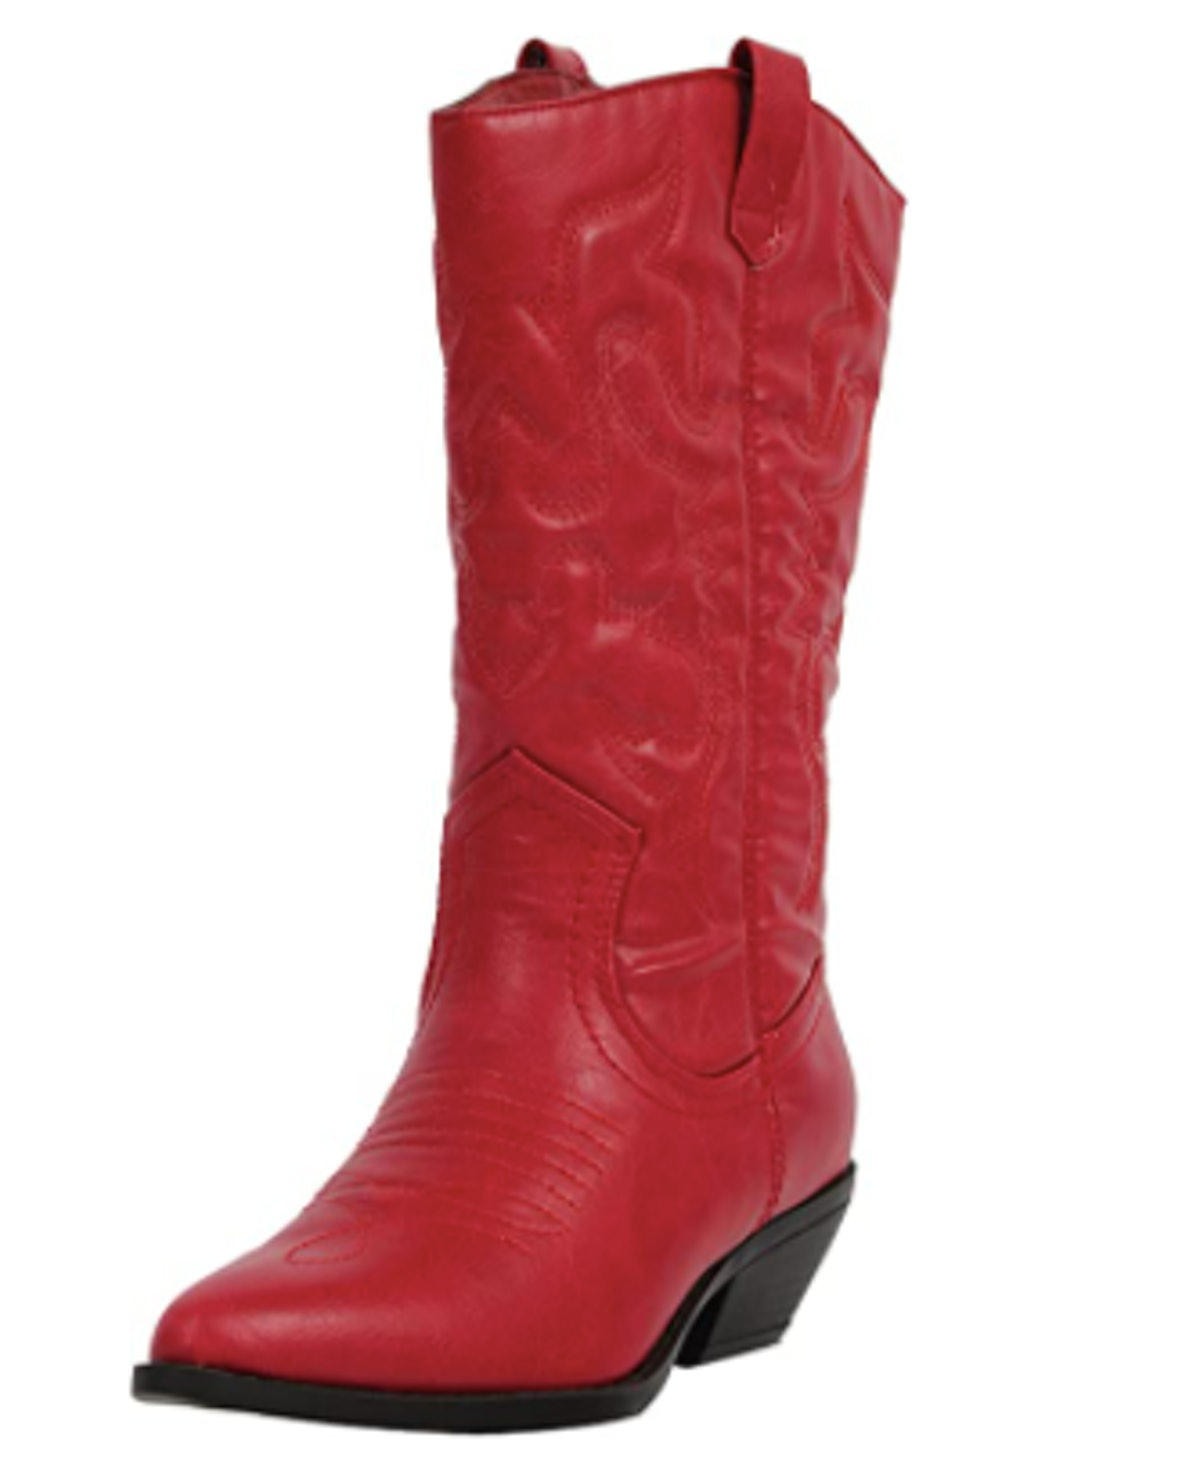 Soda Cowboy Western Stitched Boots